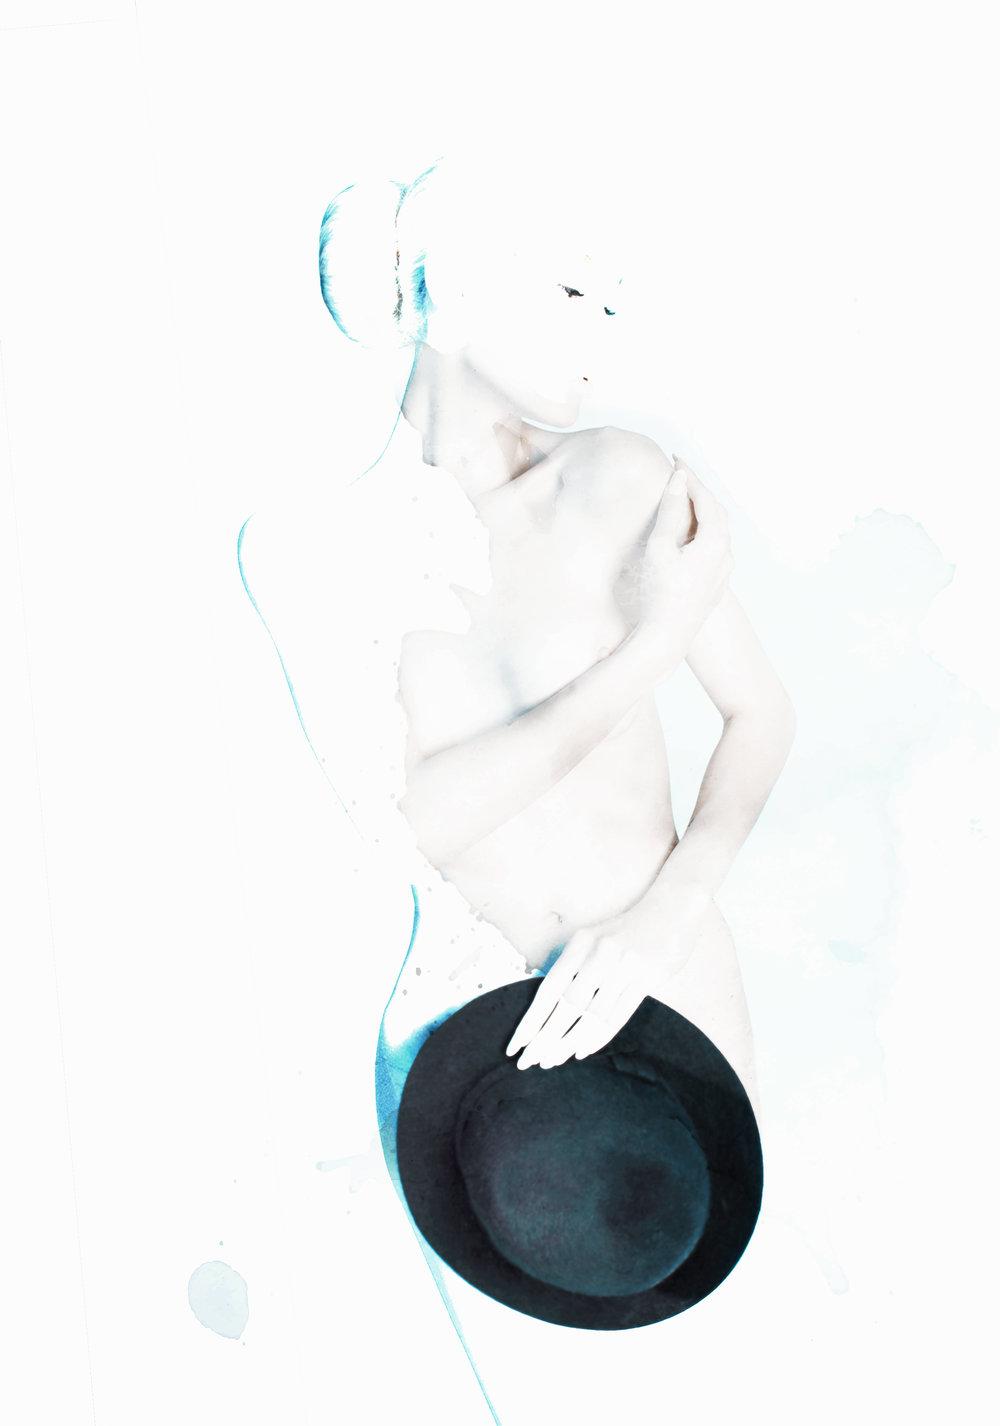 watercolor12_2.jpg